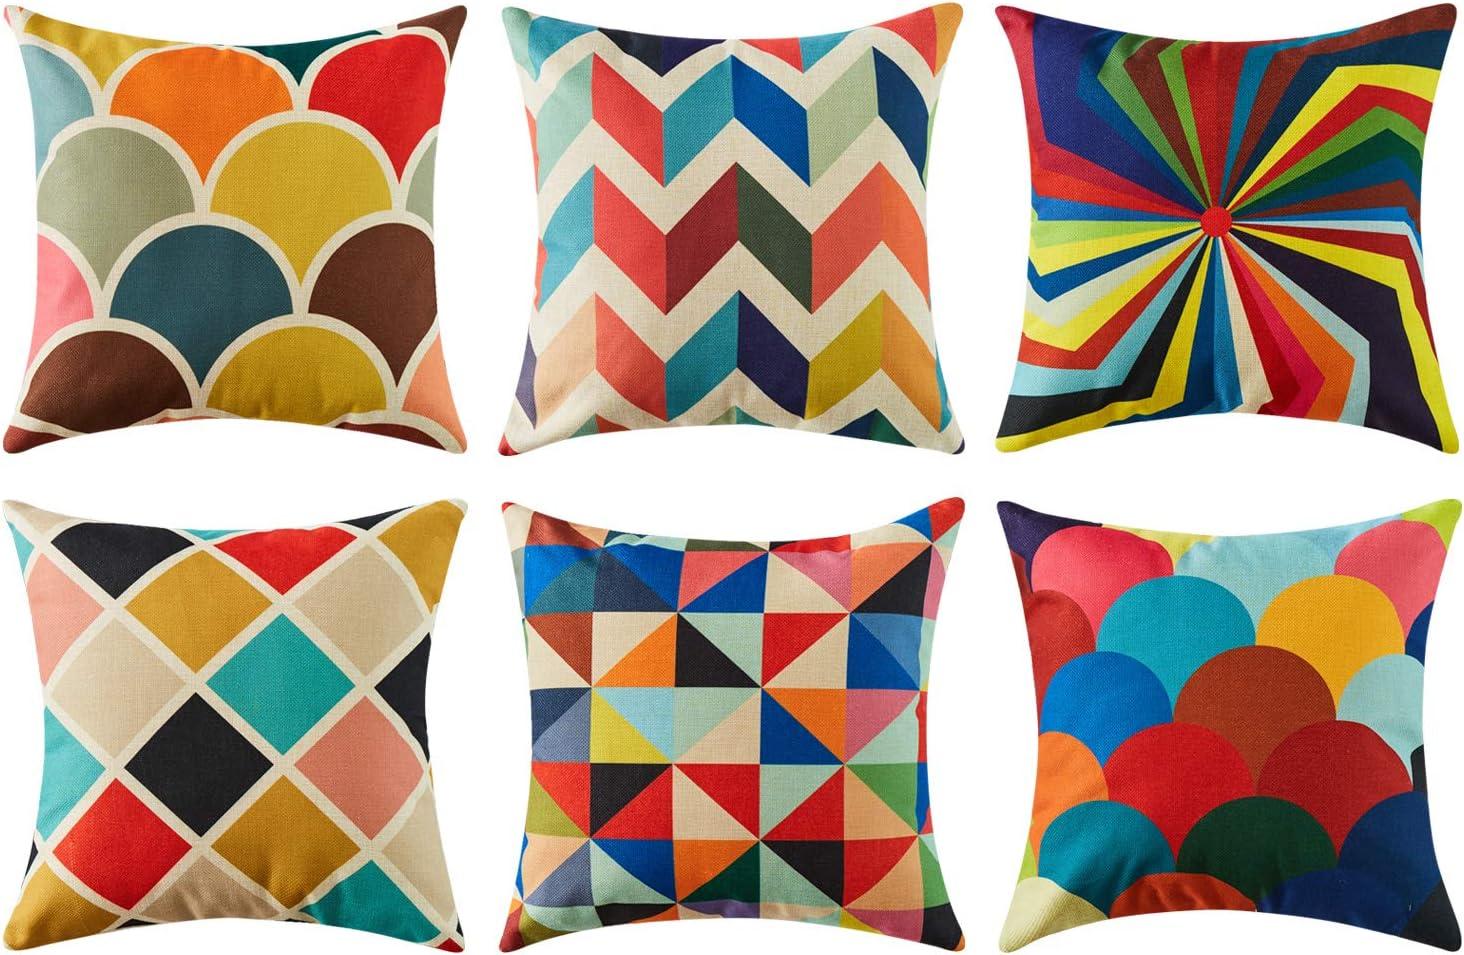 Mulitcoloured Bright Solid Colour Cushion Cover Pillow Cover Sofa Cushion Pillow